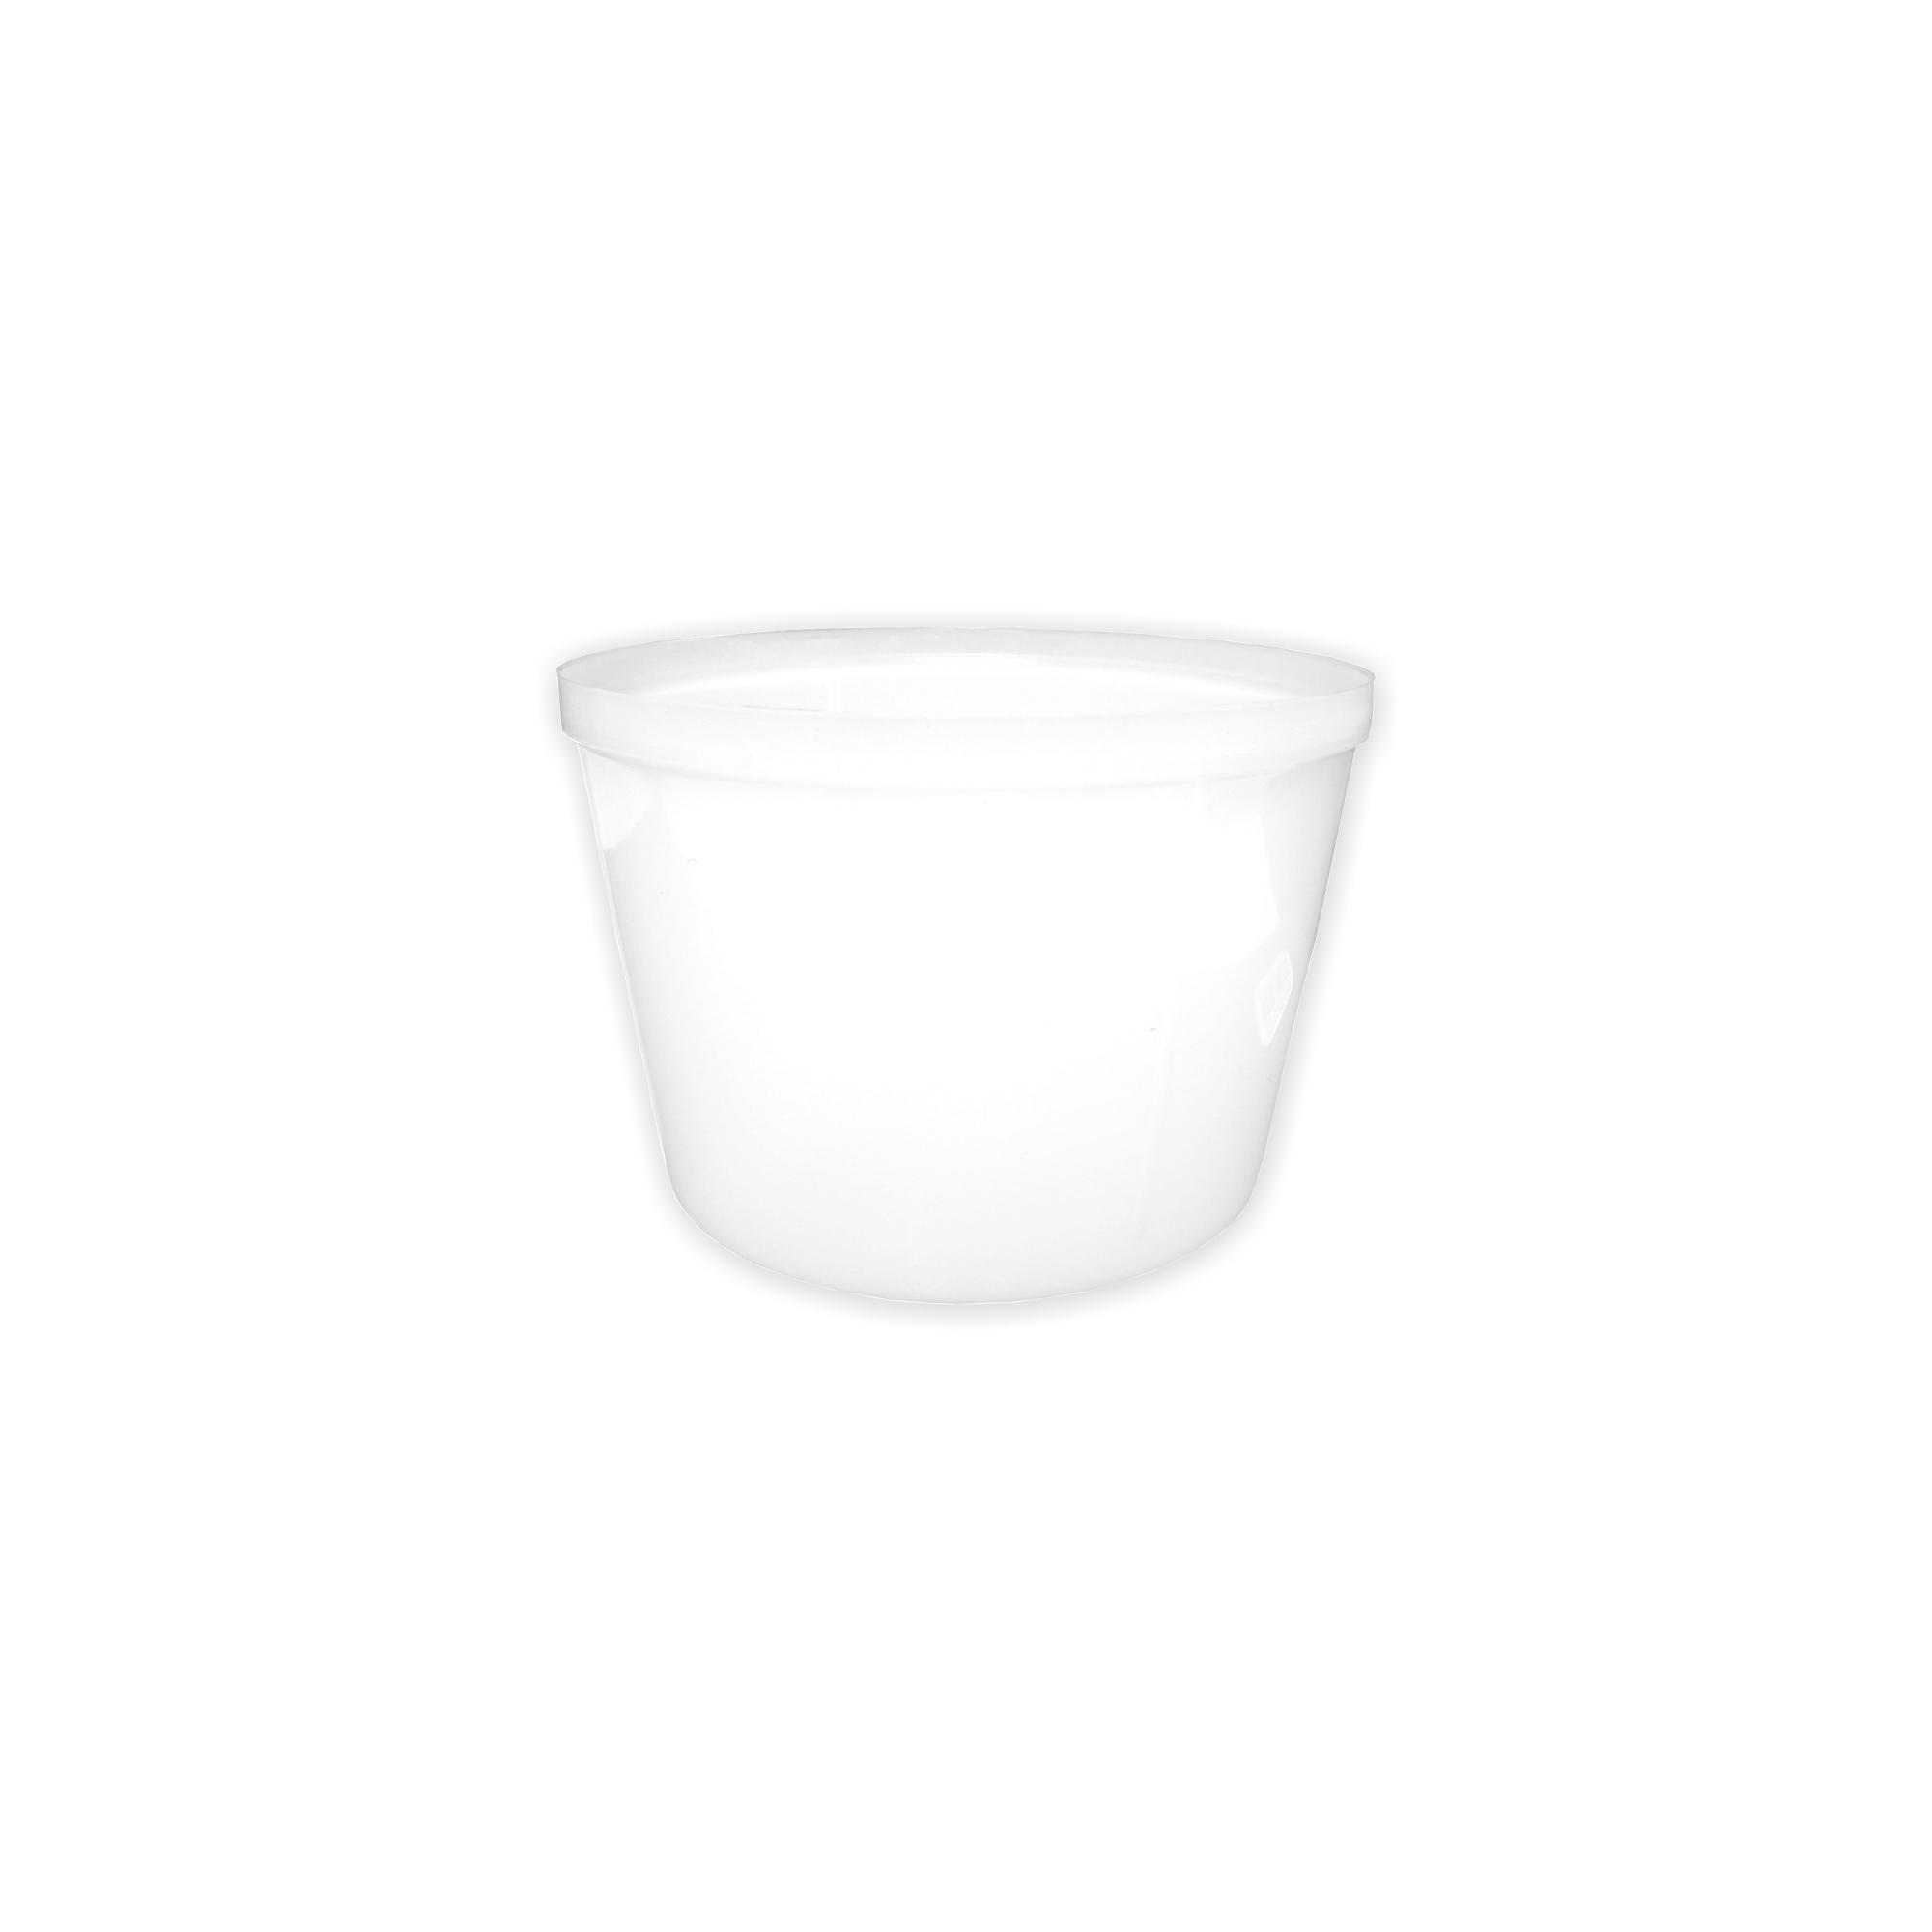 Cumbuca Plástica Incolor para Sopa